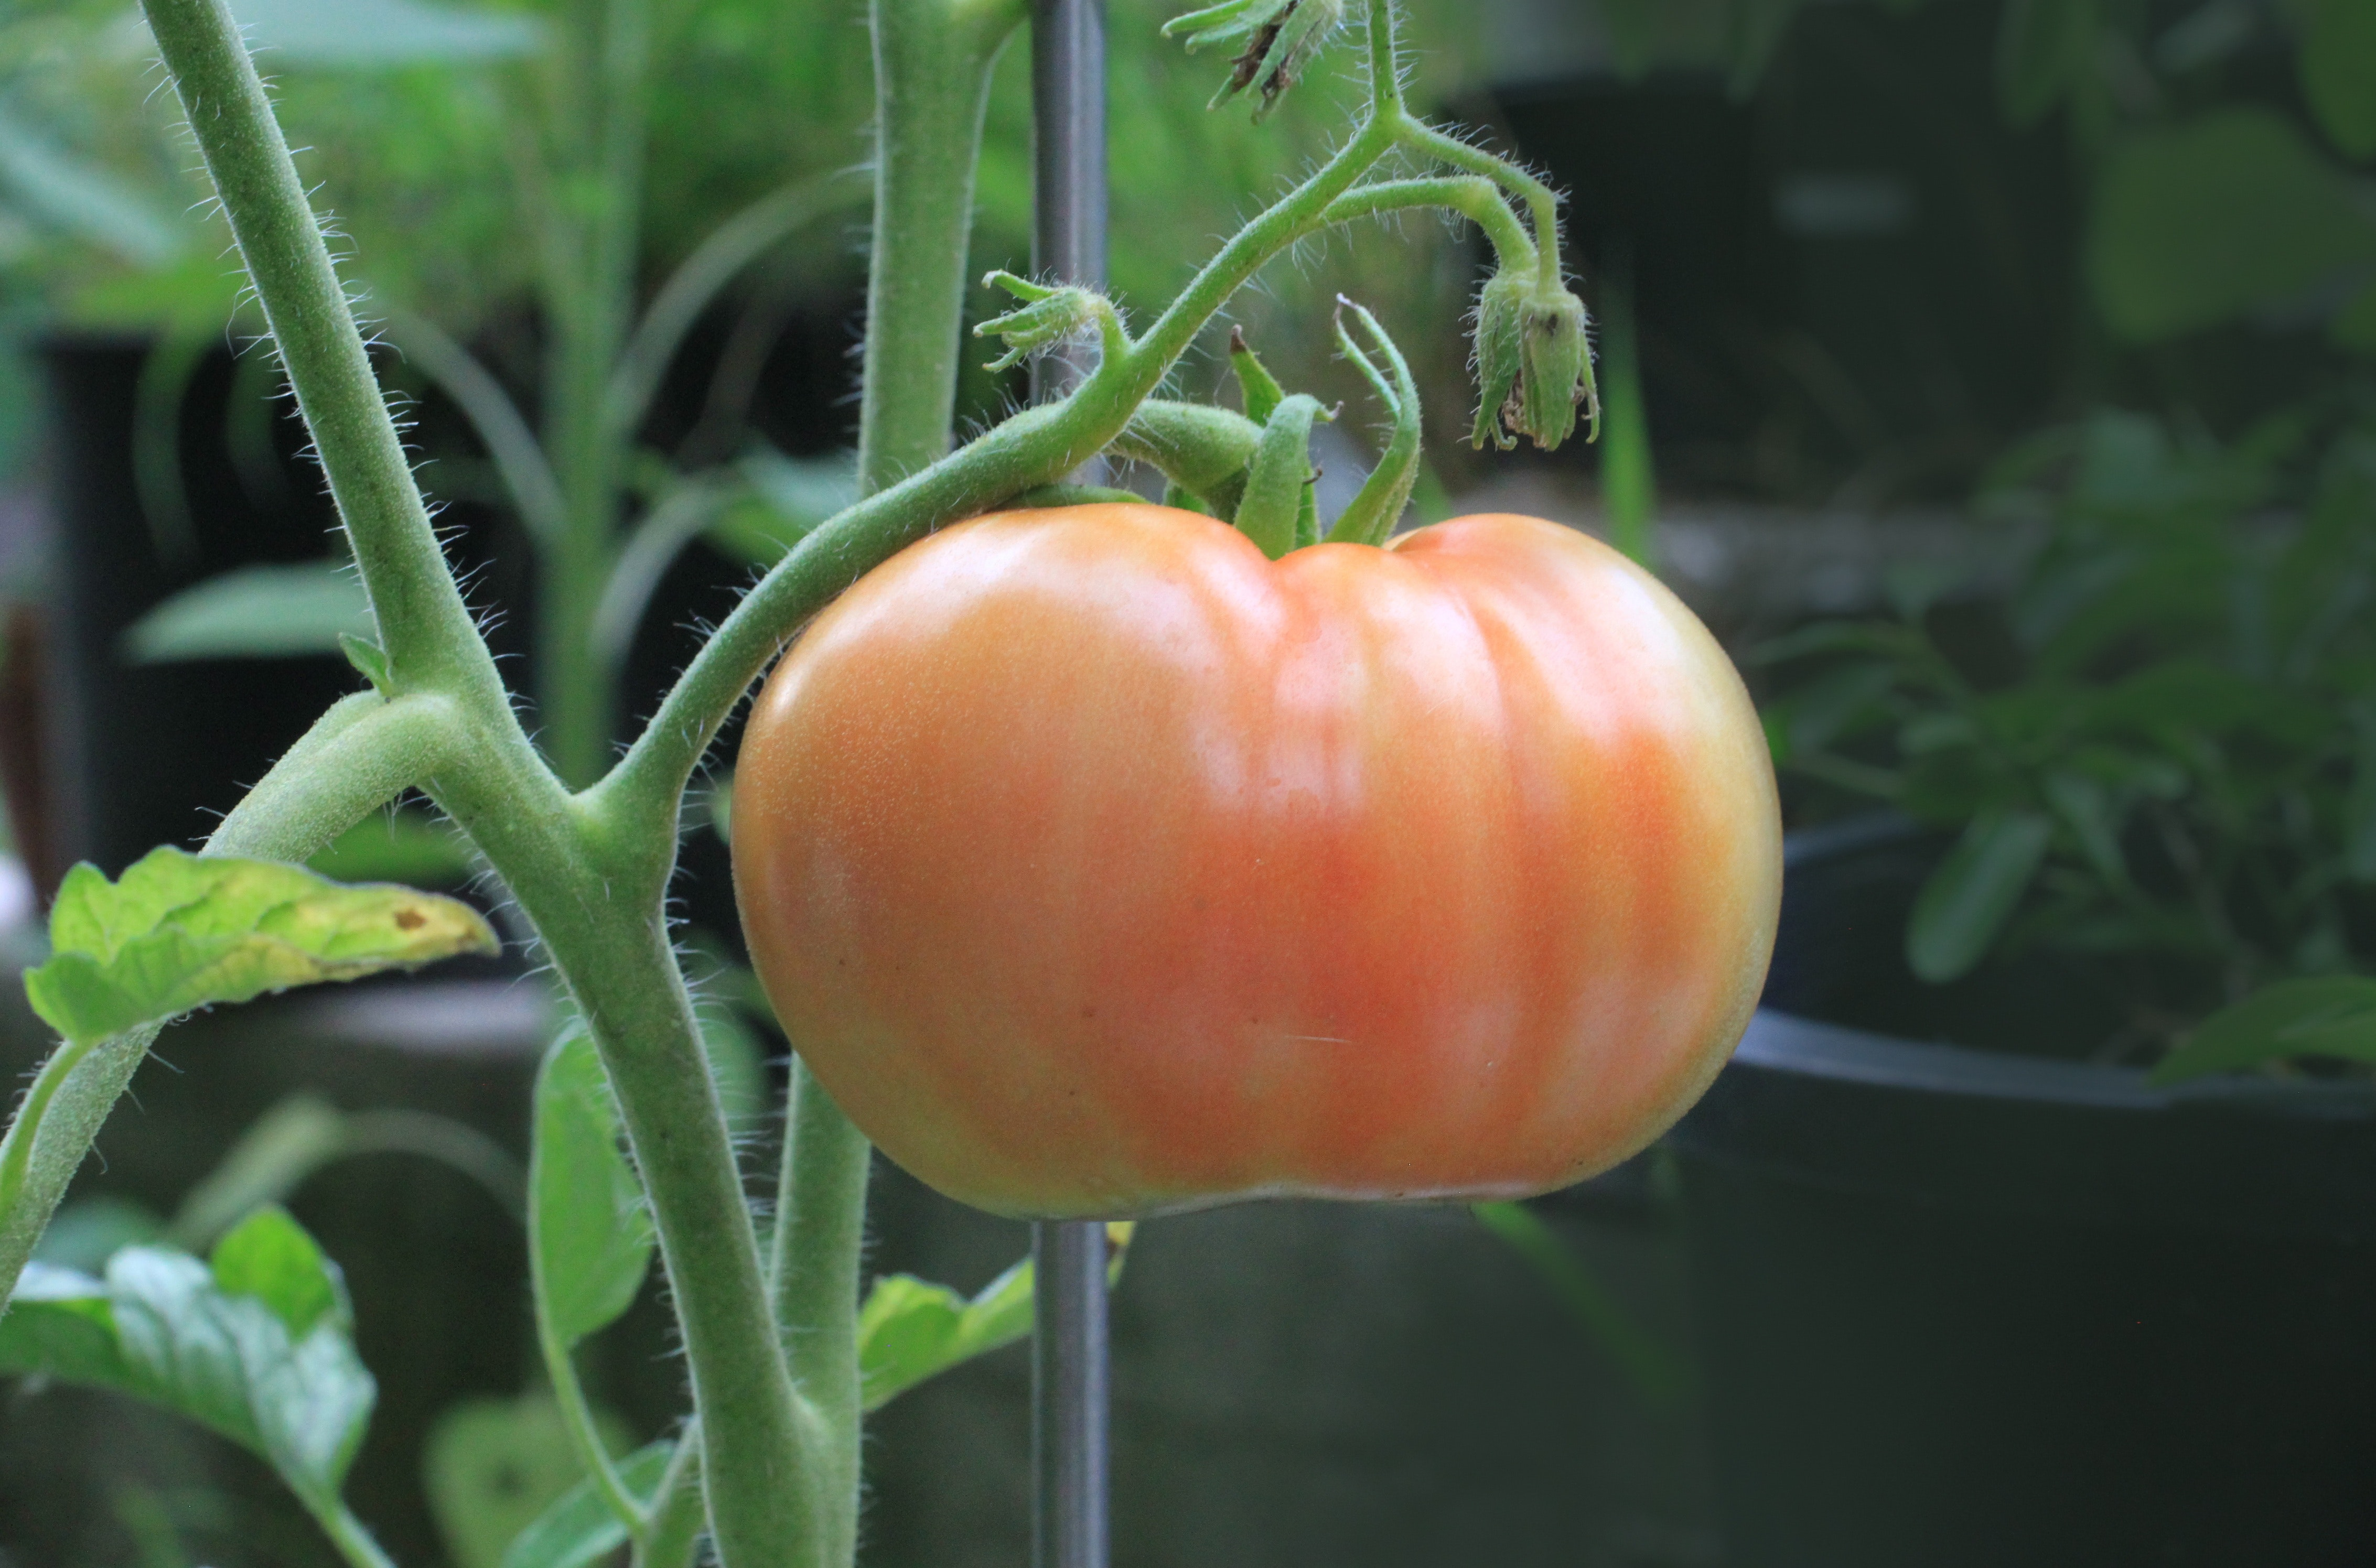 Orange tomato photo